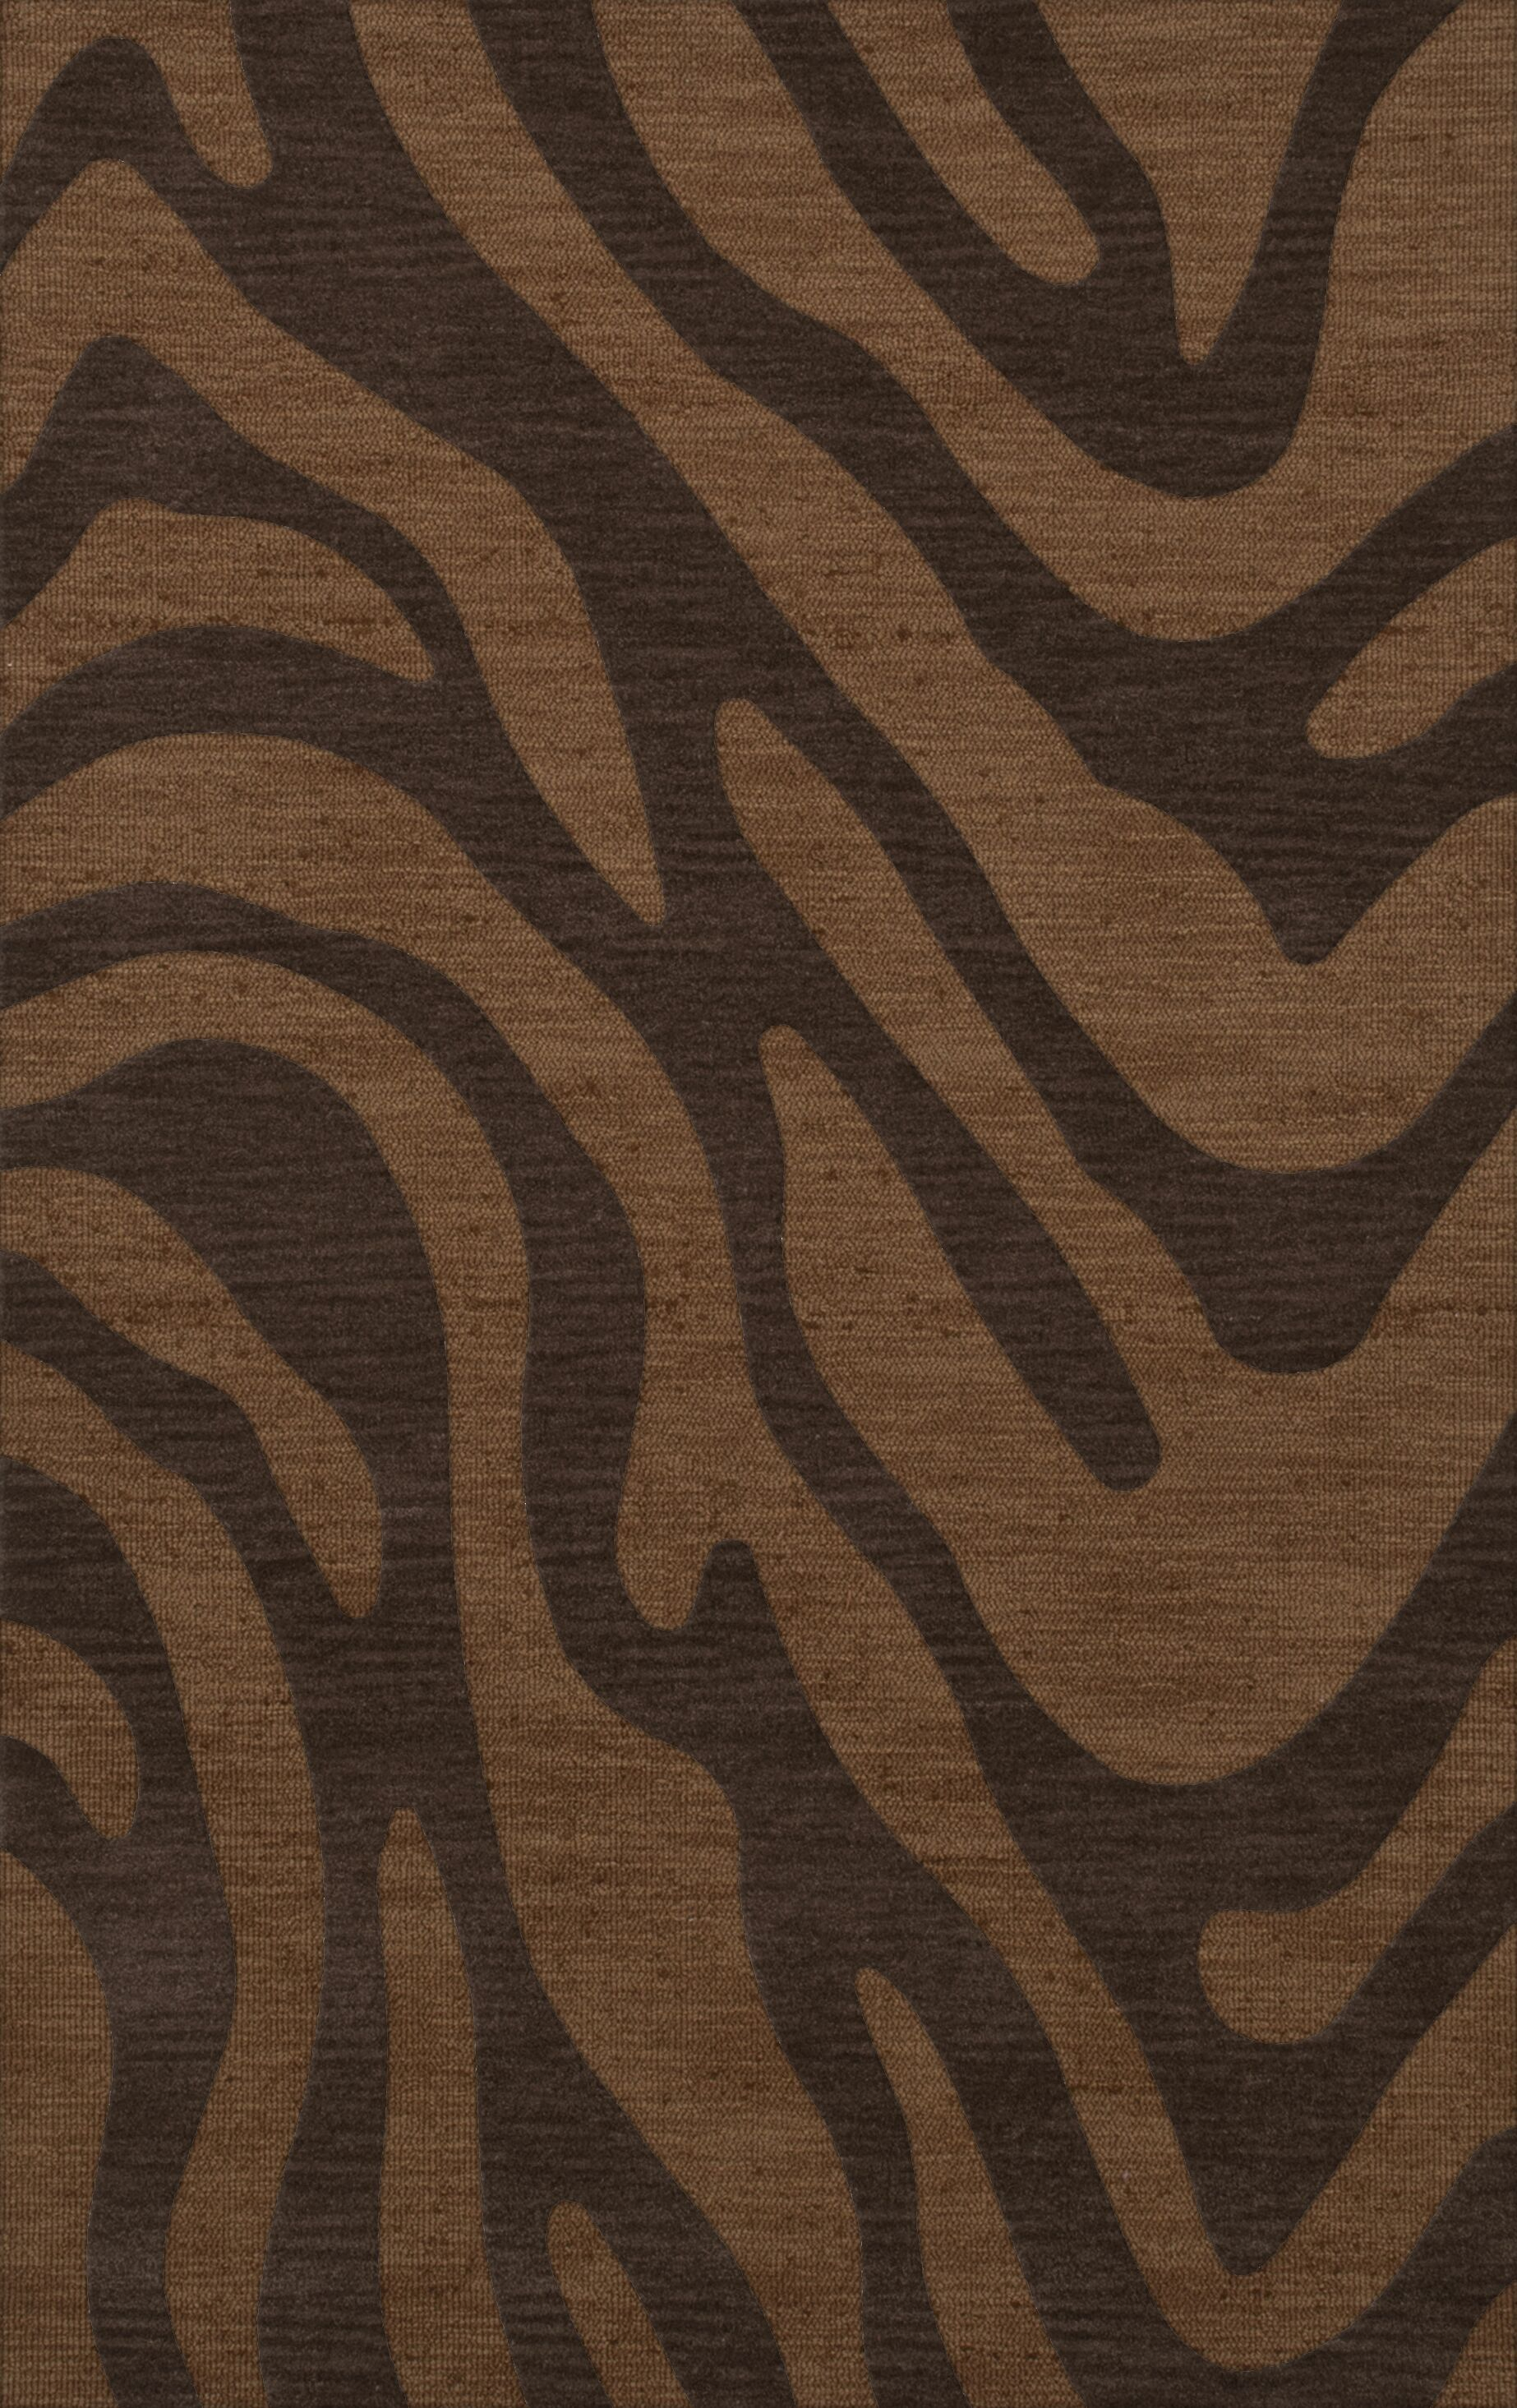 Dover Caramel Area Rug Rug Size: Rectangle 5' x 8'